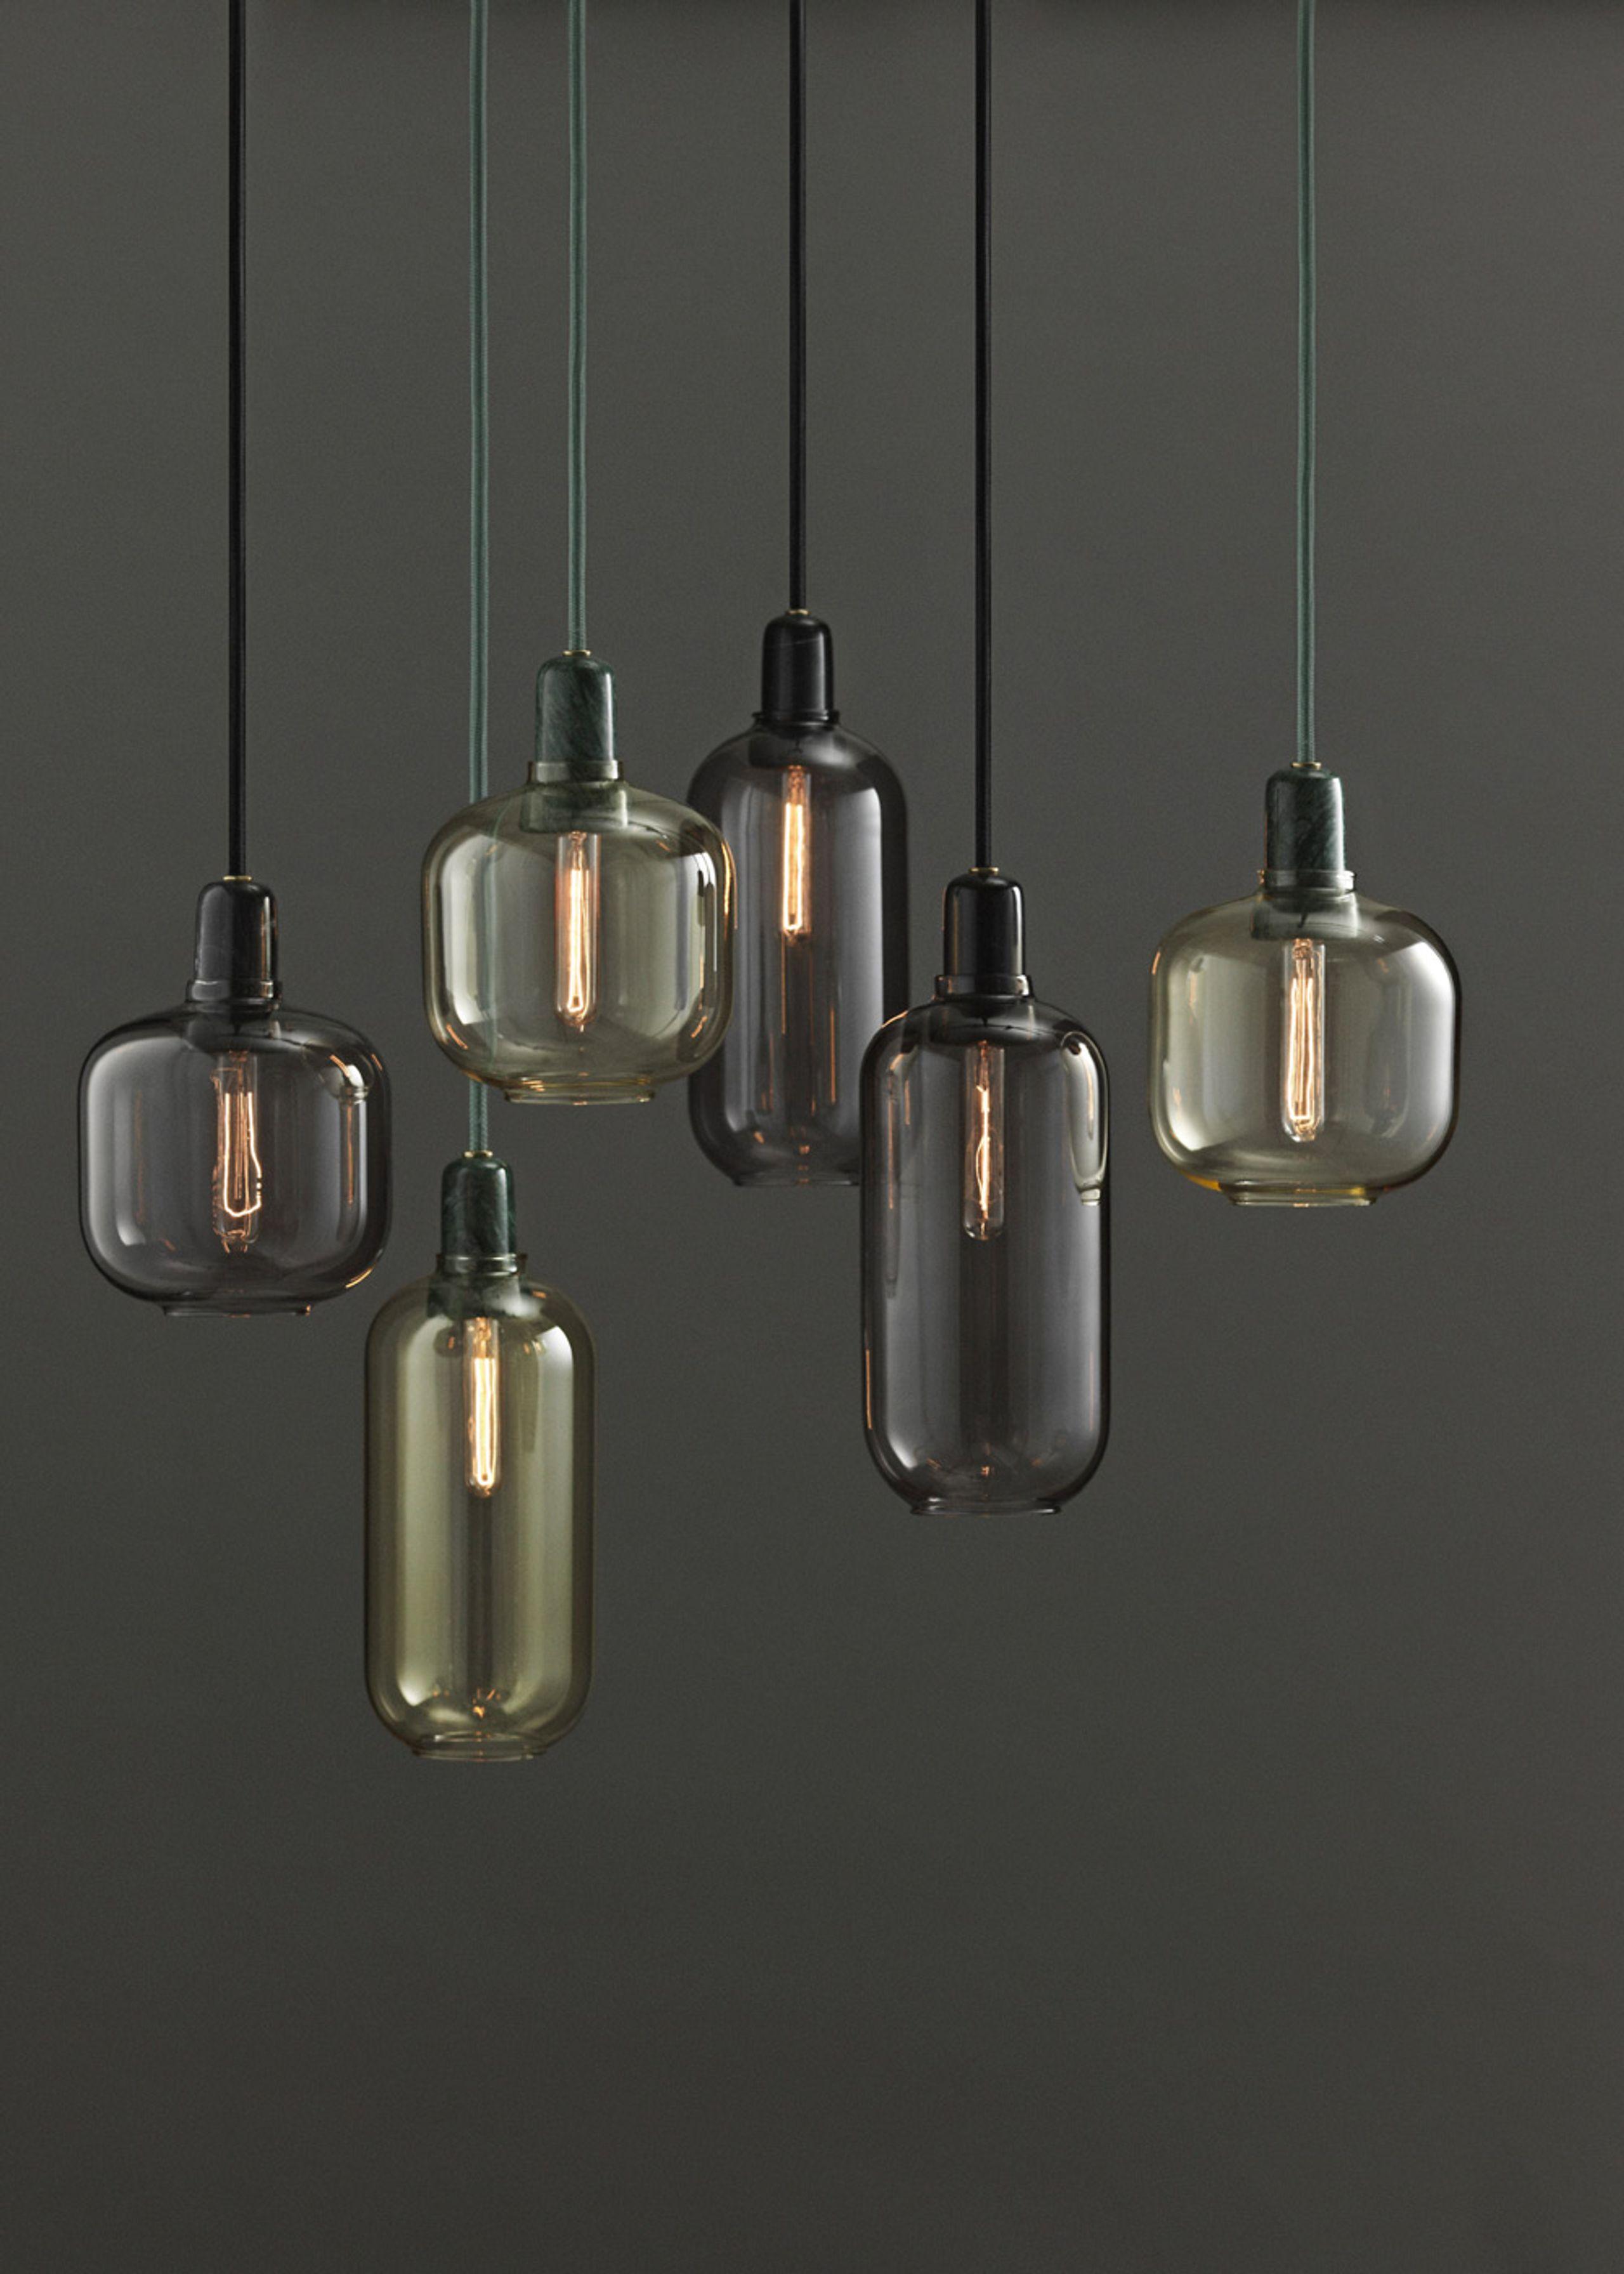 amp lamp lampe normann copenhagen. Black Bedroom Furniture Sets. Home Design Ideas